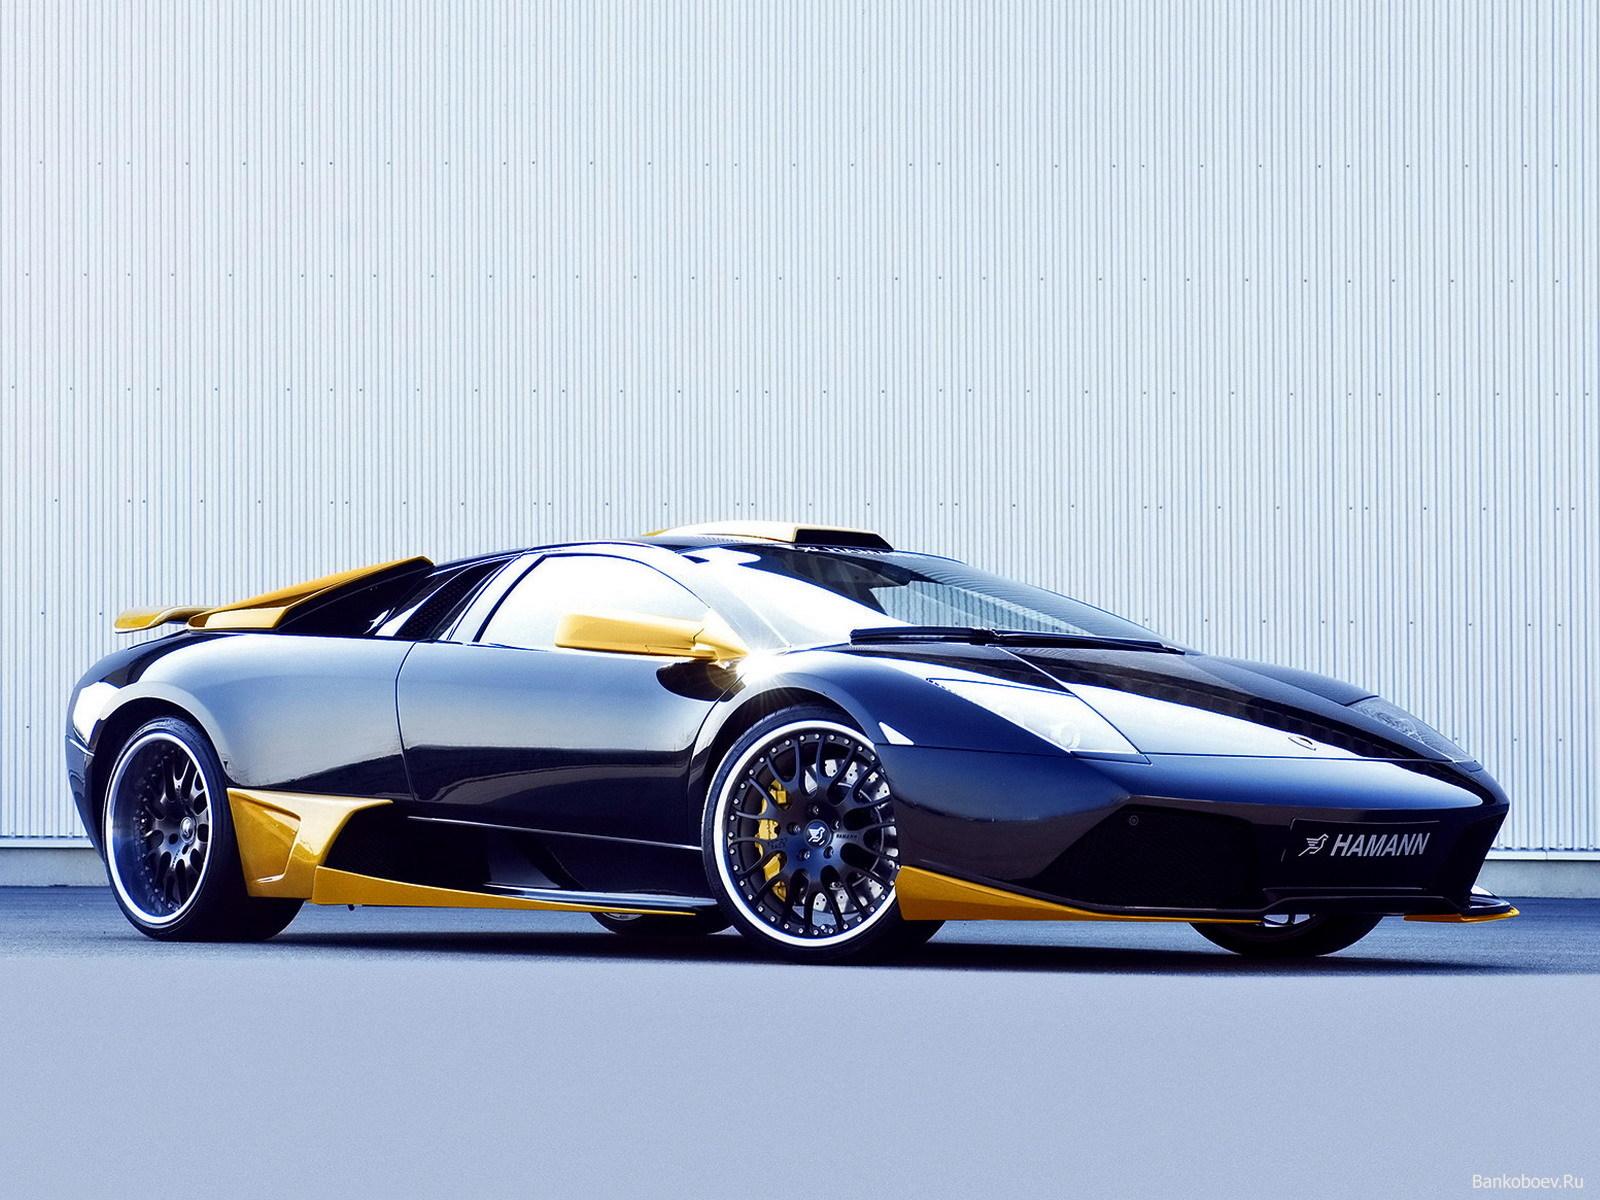 Free Download Black And Gold Lamborghini 14 Cool Wallpaper